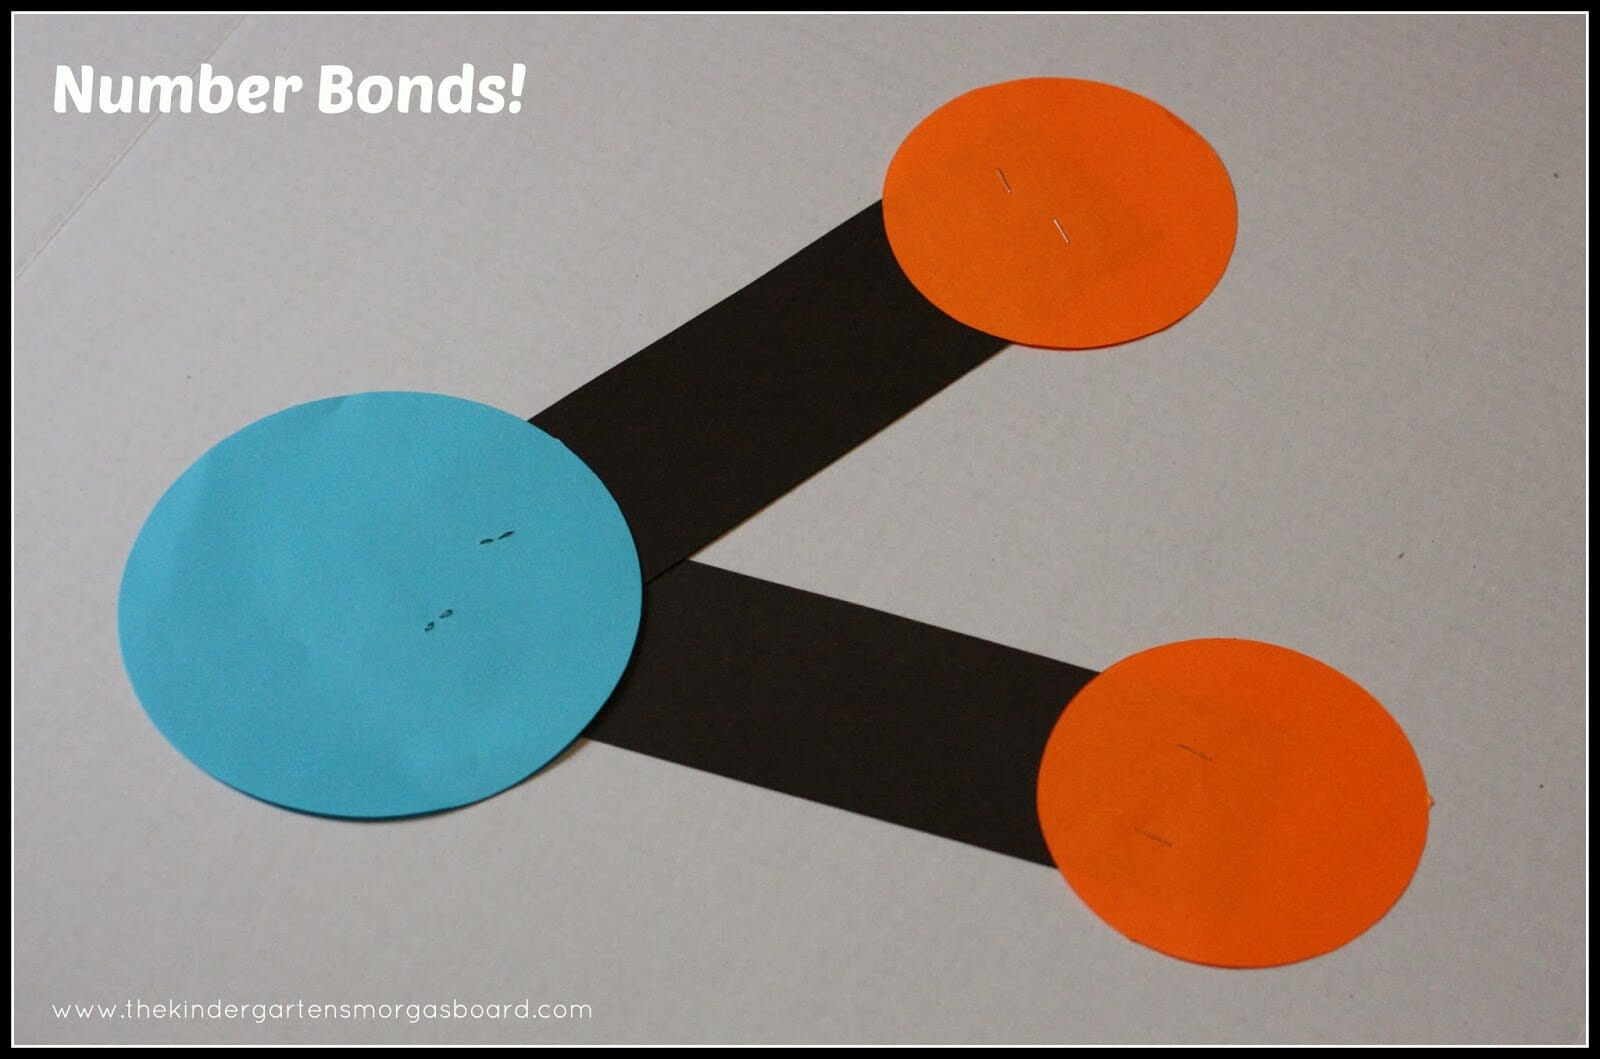 Number Bonds Lesson